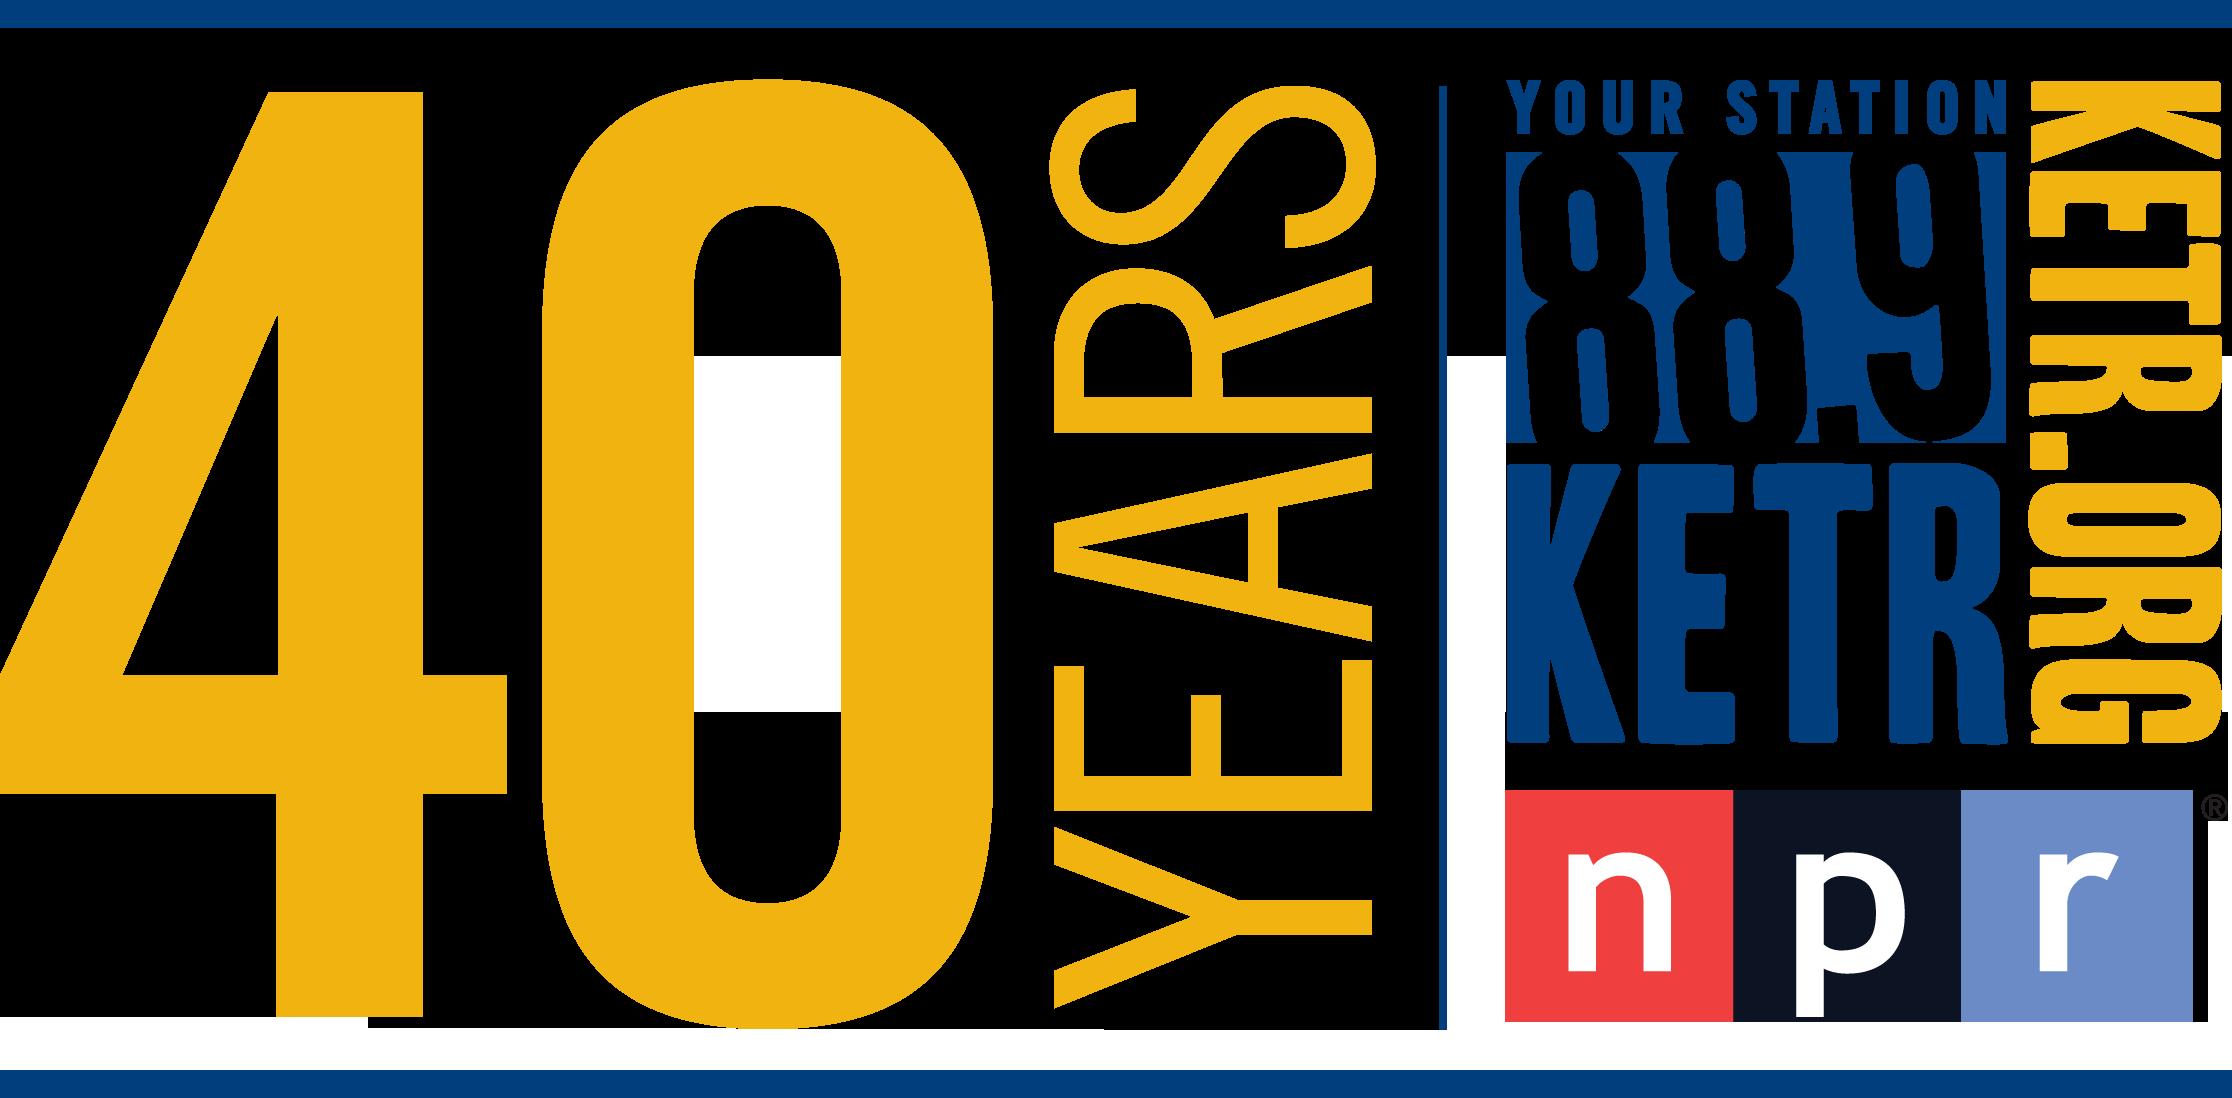 88.9 KETR logo